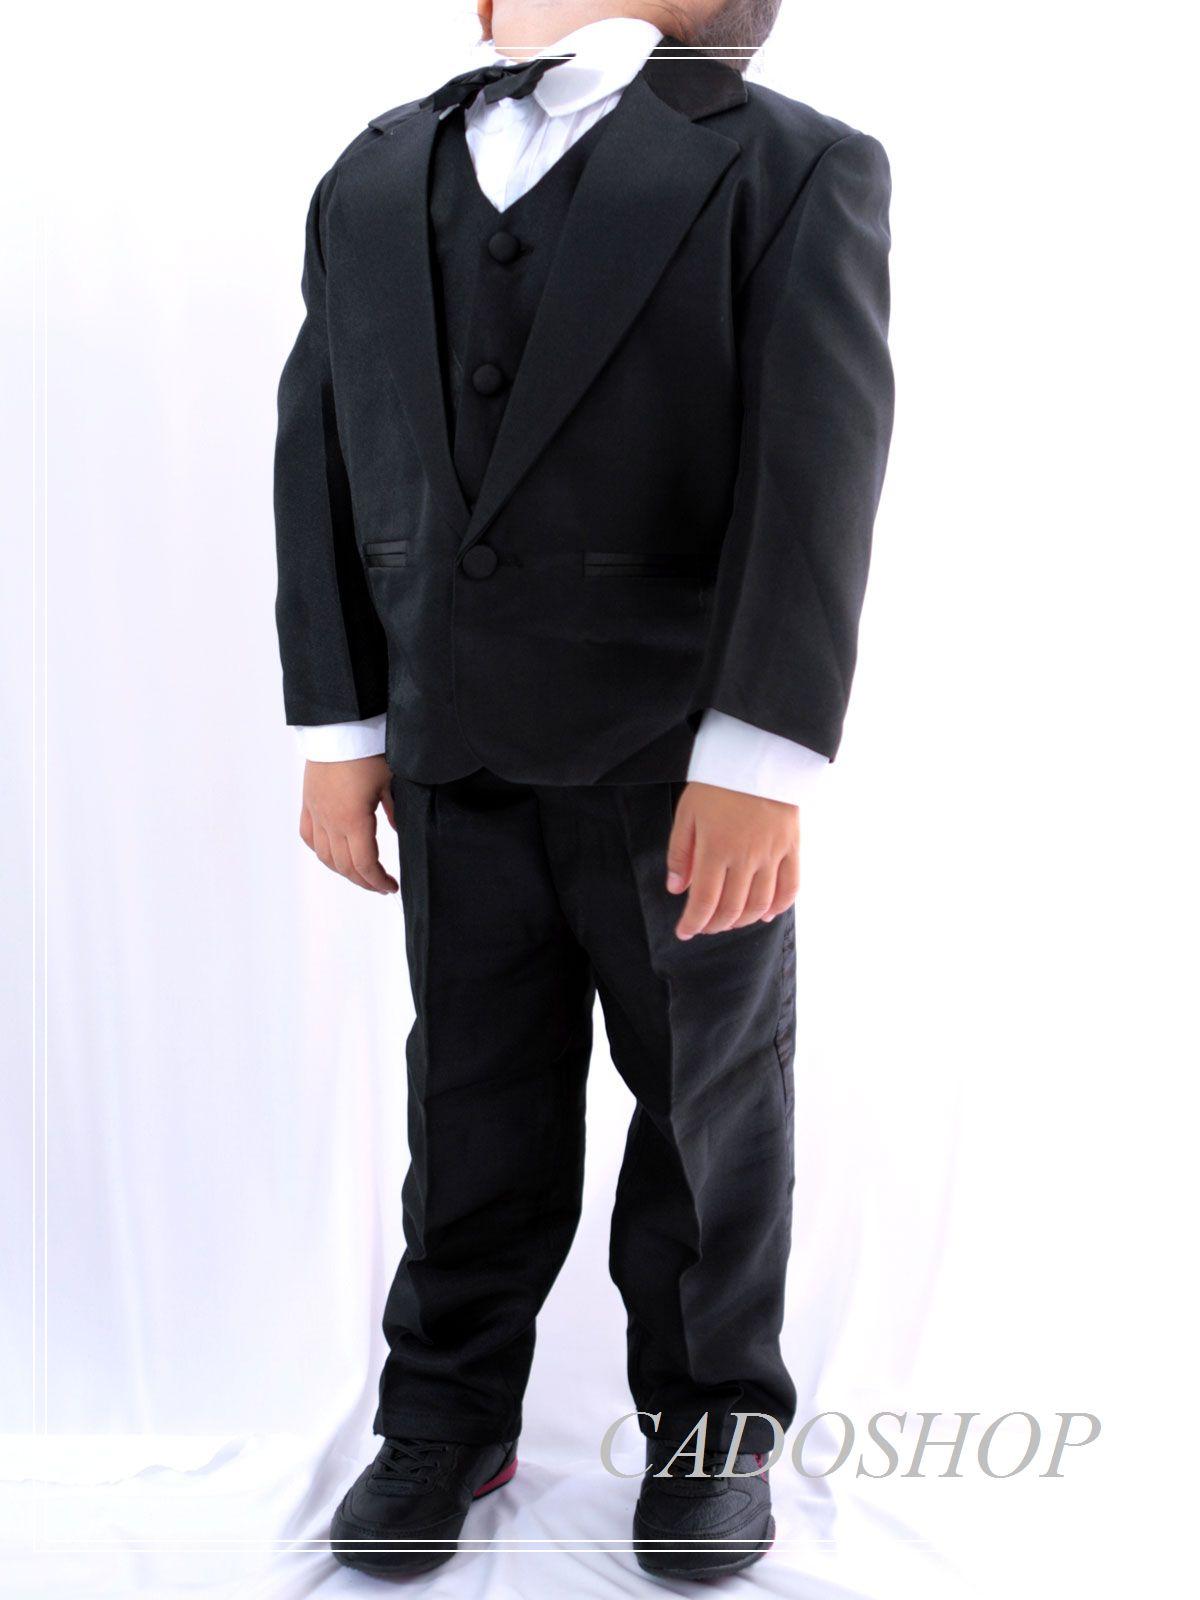 Costume enfant garçon 6 mois 1 2 3 ans mariage cérémonie baptême soirée  VCS47. CADOSHOP. VCS47. IMG 8230. IMG 8243. IMG 8242 a6e495505c0